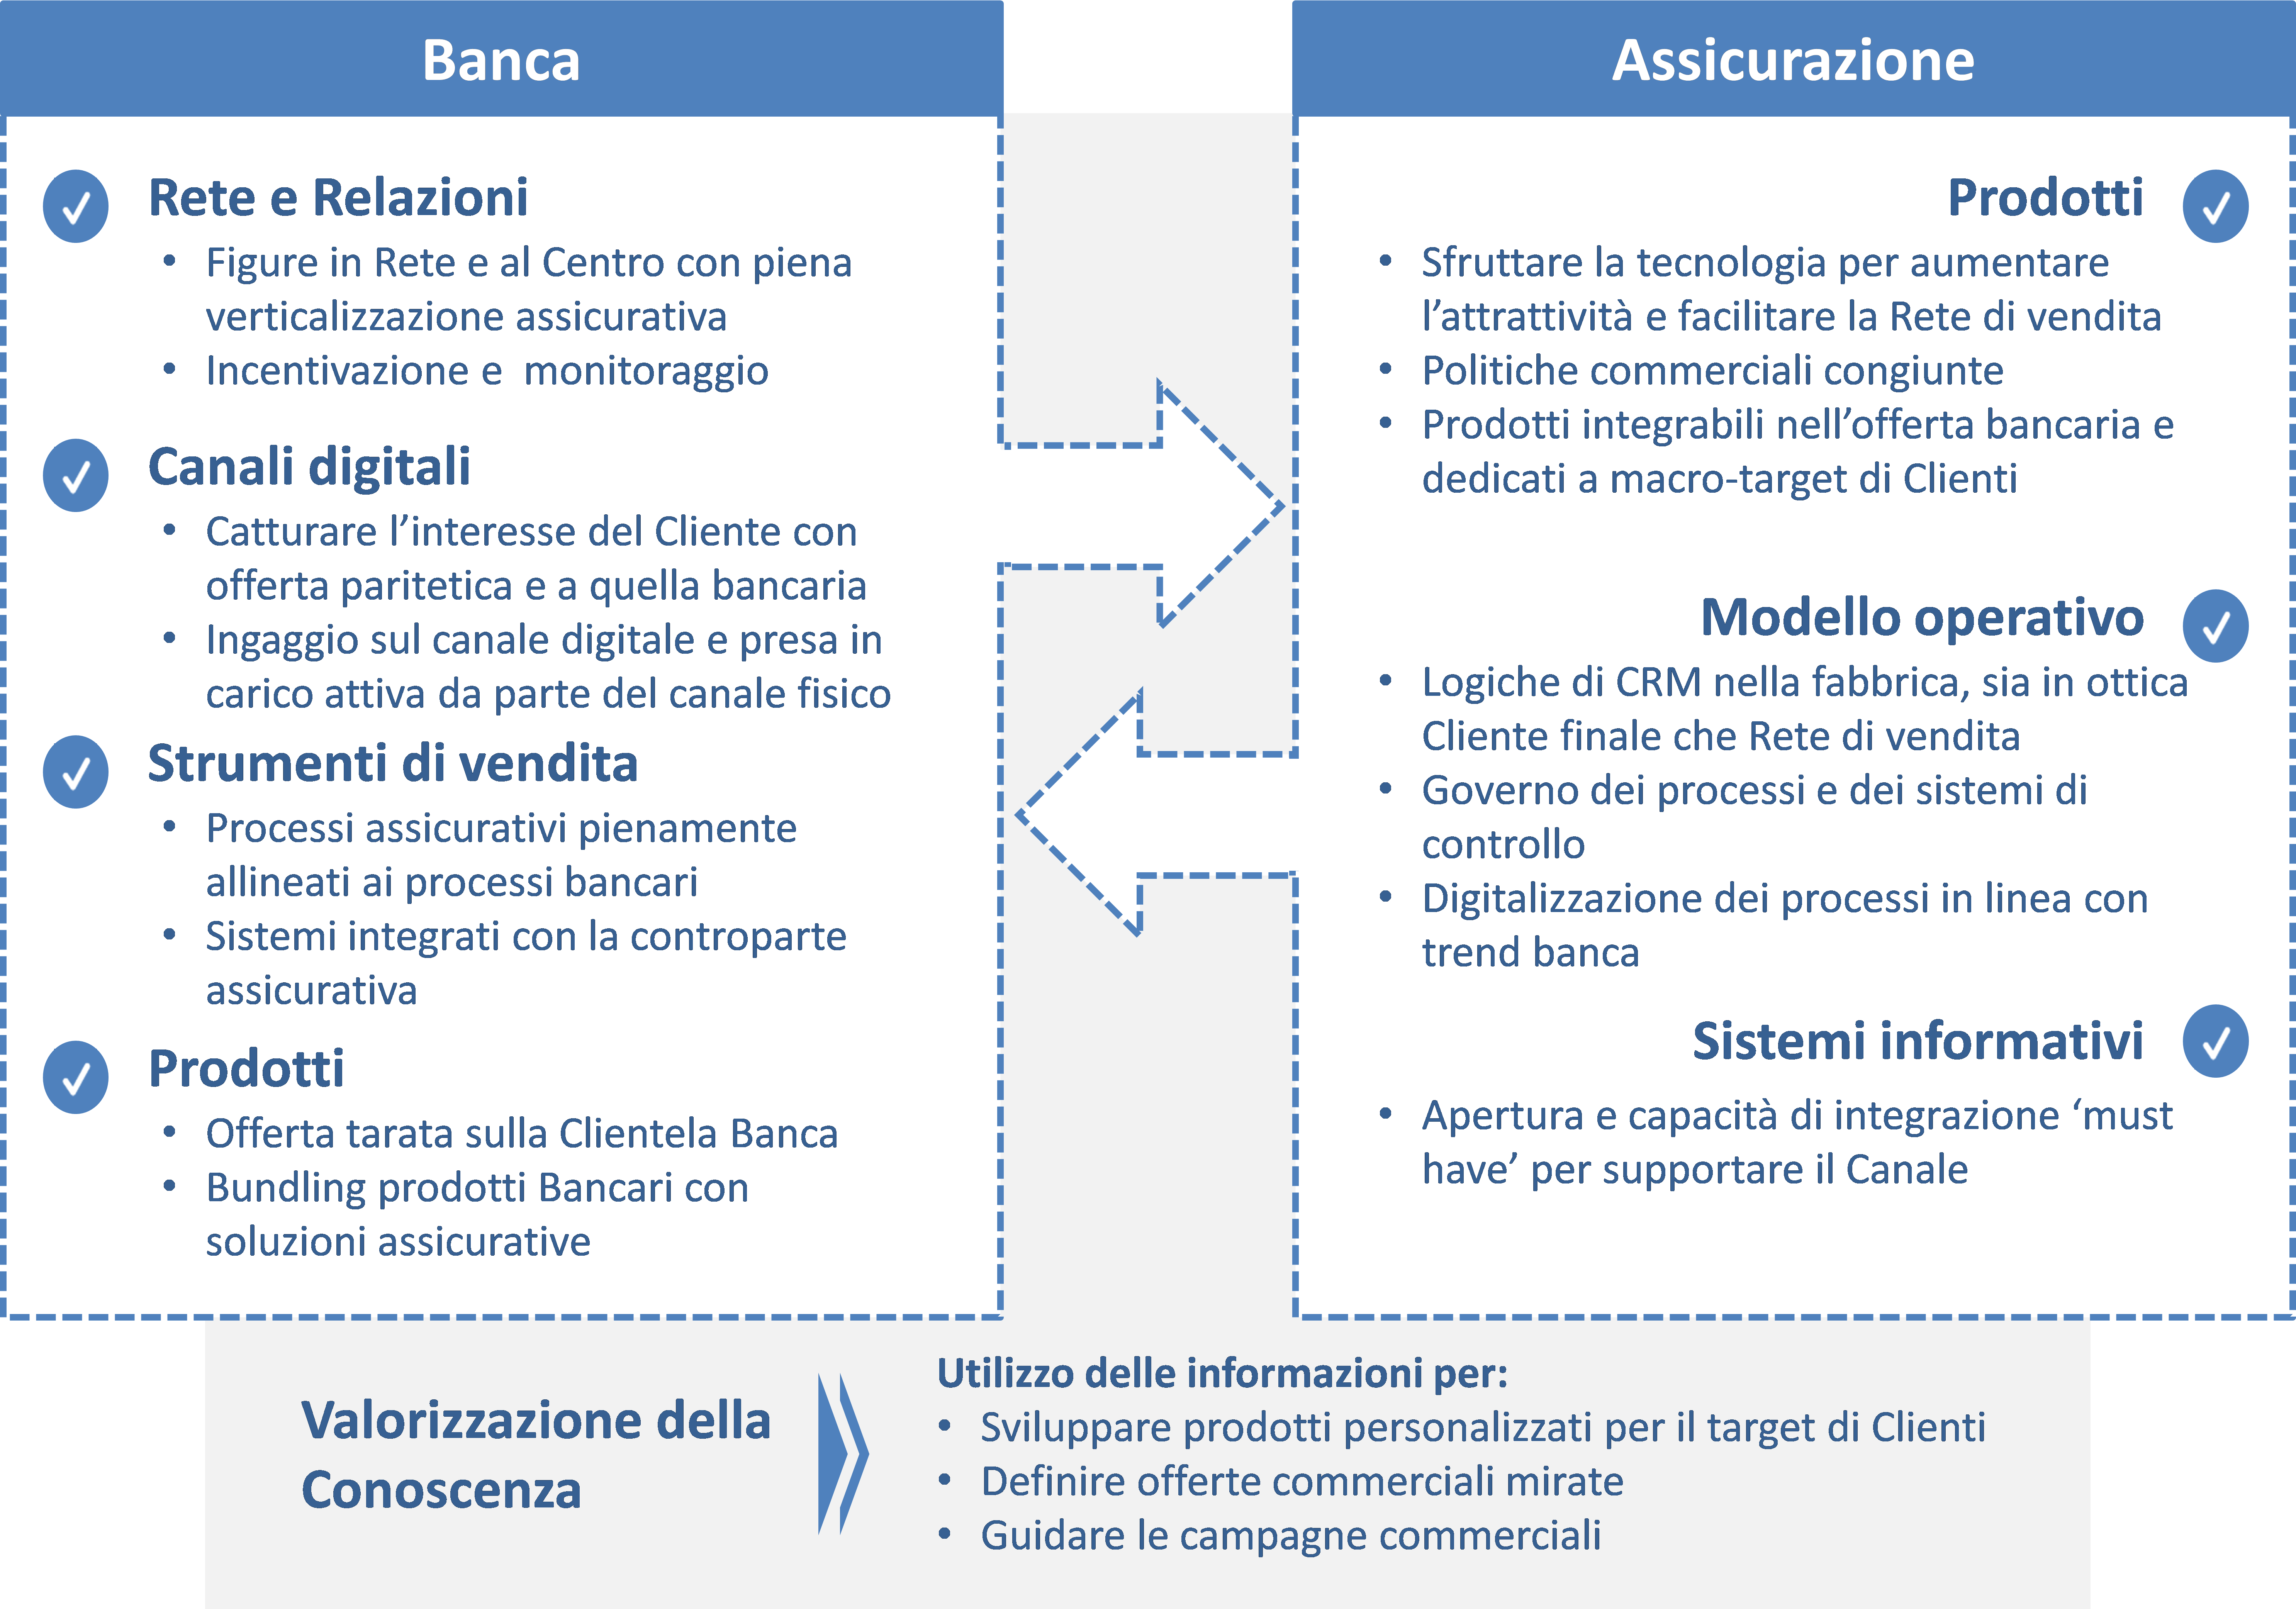 bancassurance1.png